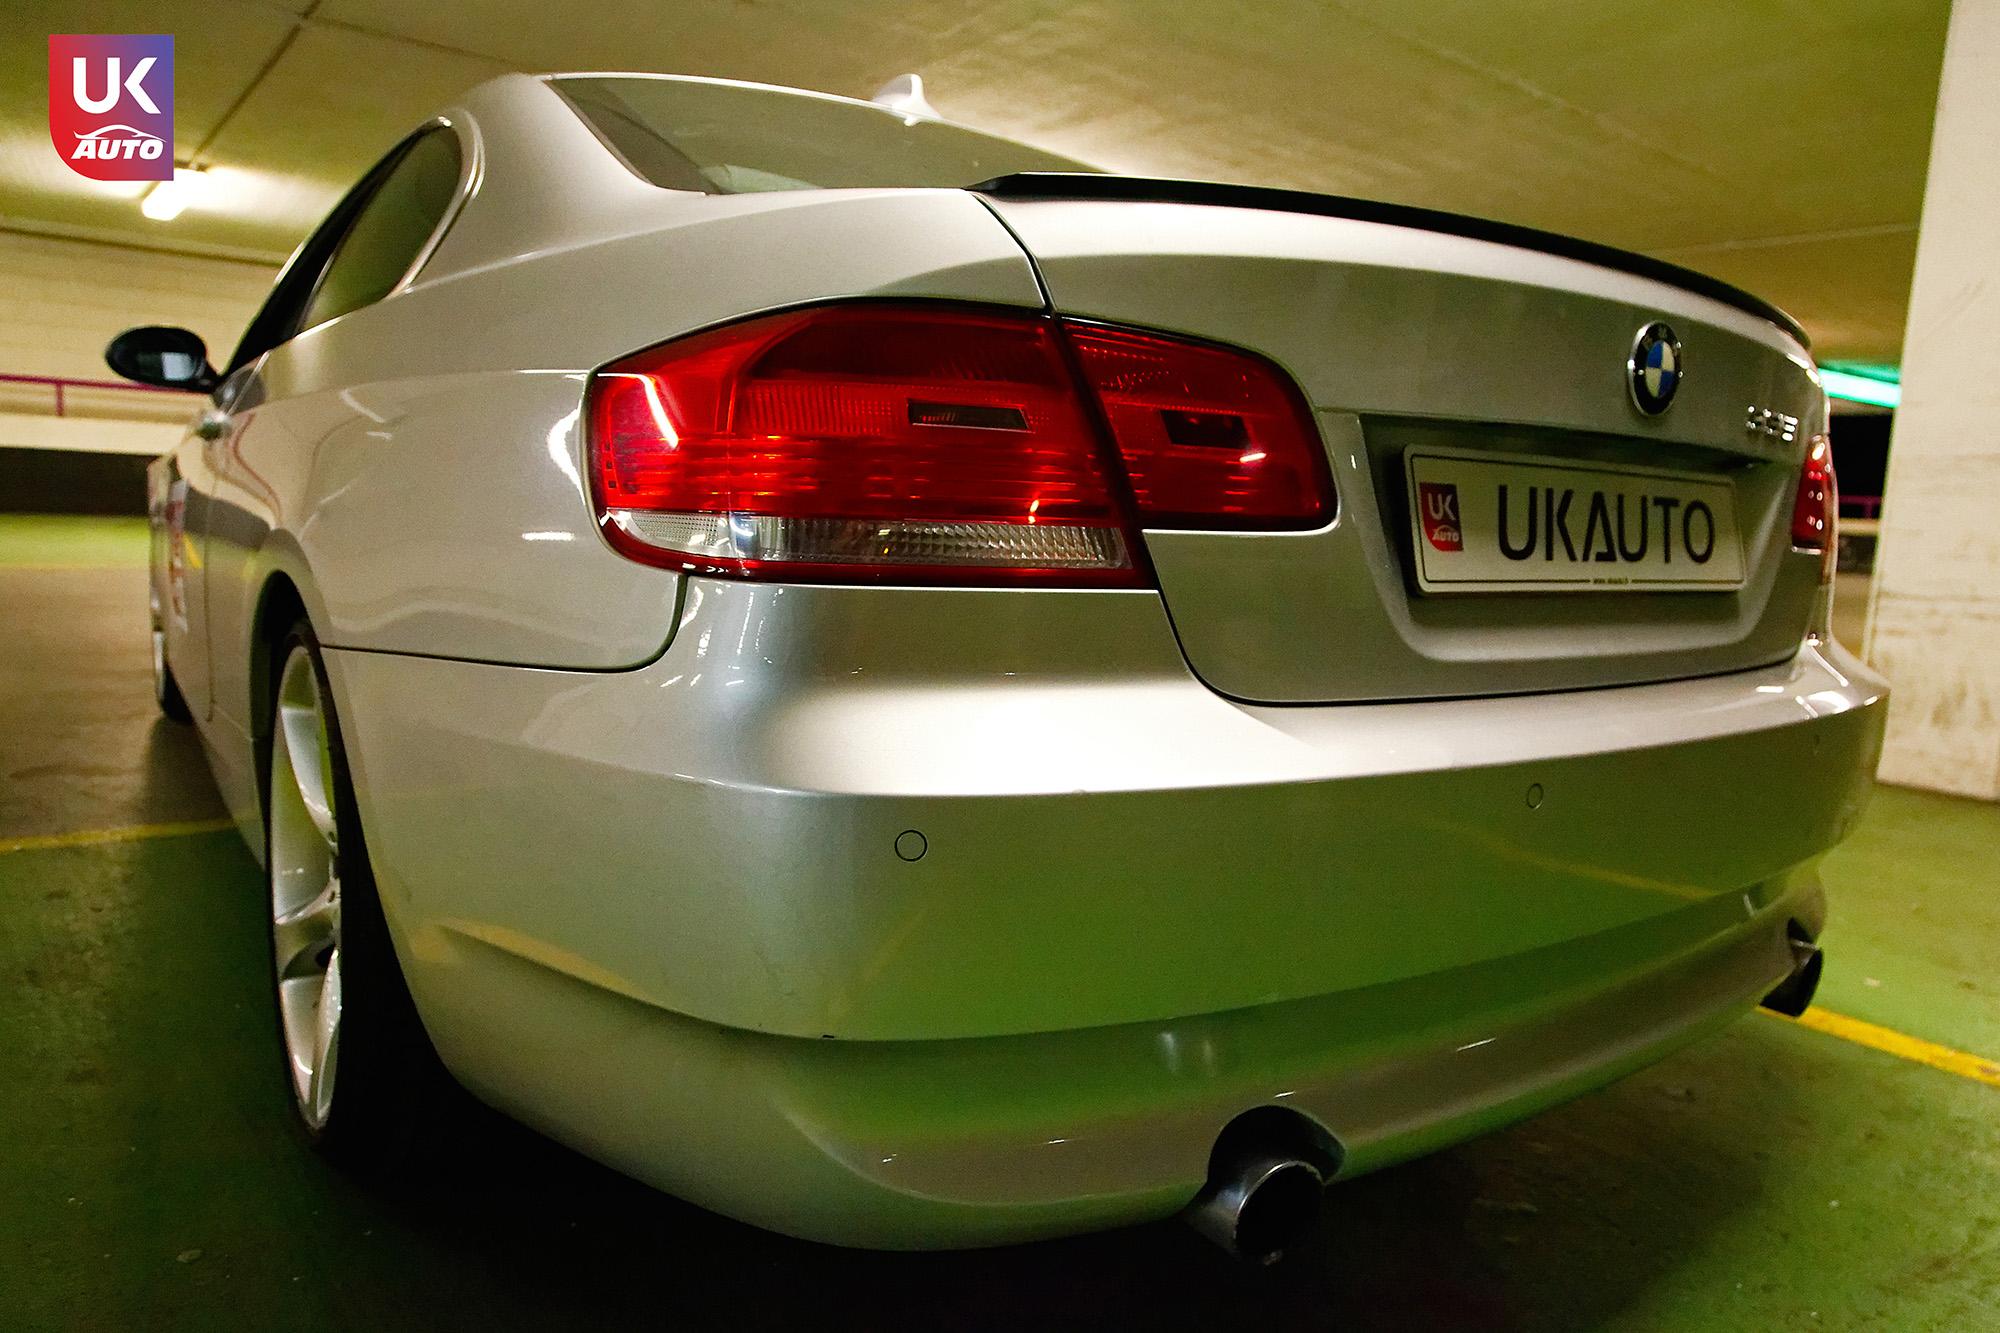 Bmw 335i rhd import uk bmw occasion bmw mandataire e92 rhd coupe uk auto uk ukauto4 - Felecitation a Julien pour cette BMW 335i E92 COUPE RHD importateur voitures anglaises